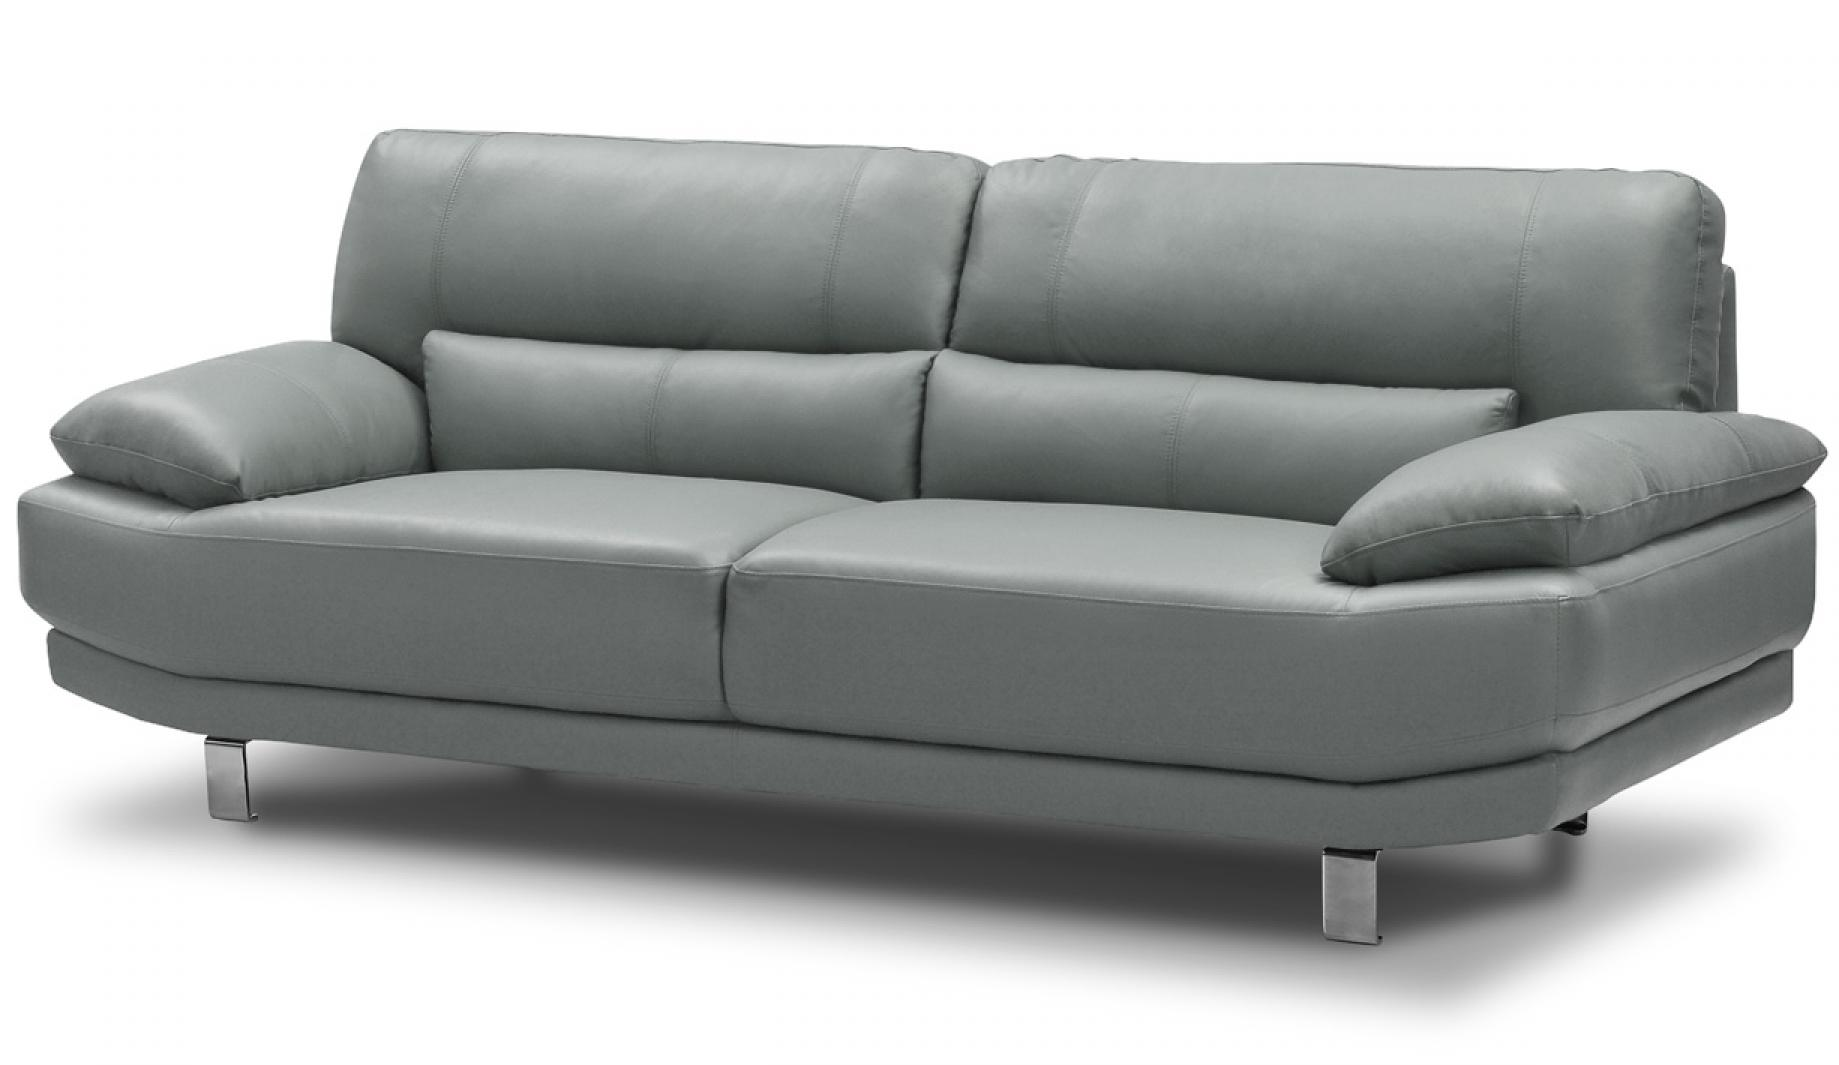 photos canap gris clair cuir. Black Bedroom Furniture Sets. Home Design Ideas